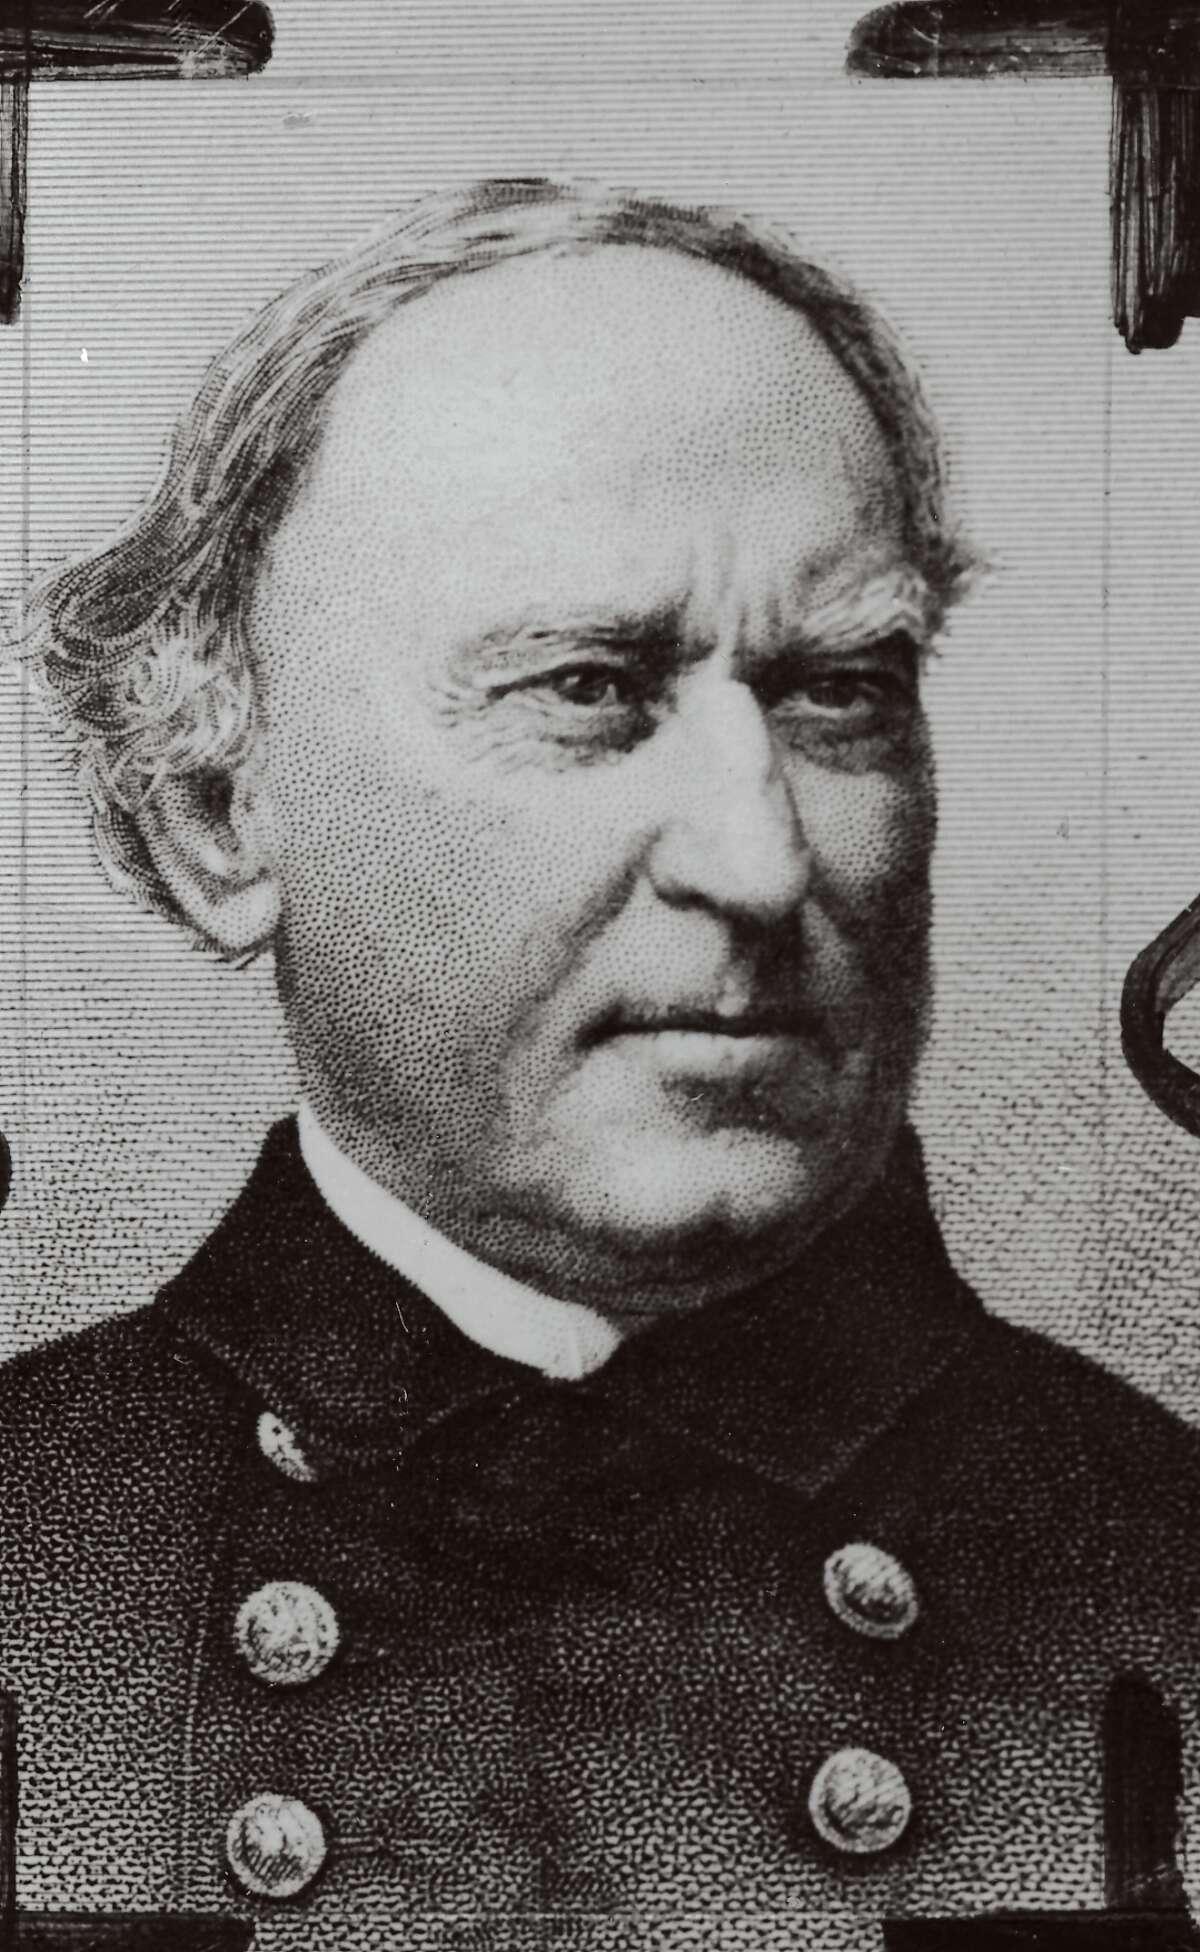 Capt. David G. Farragut established the Mare Island Naval Yard.